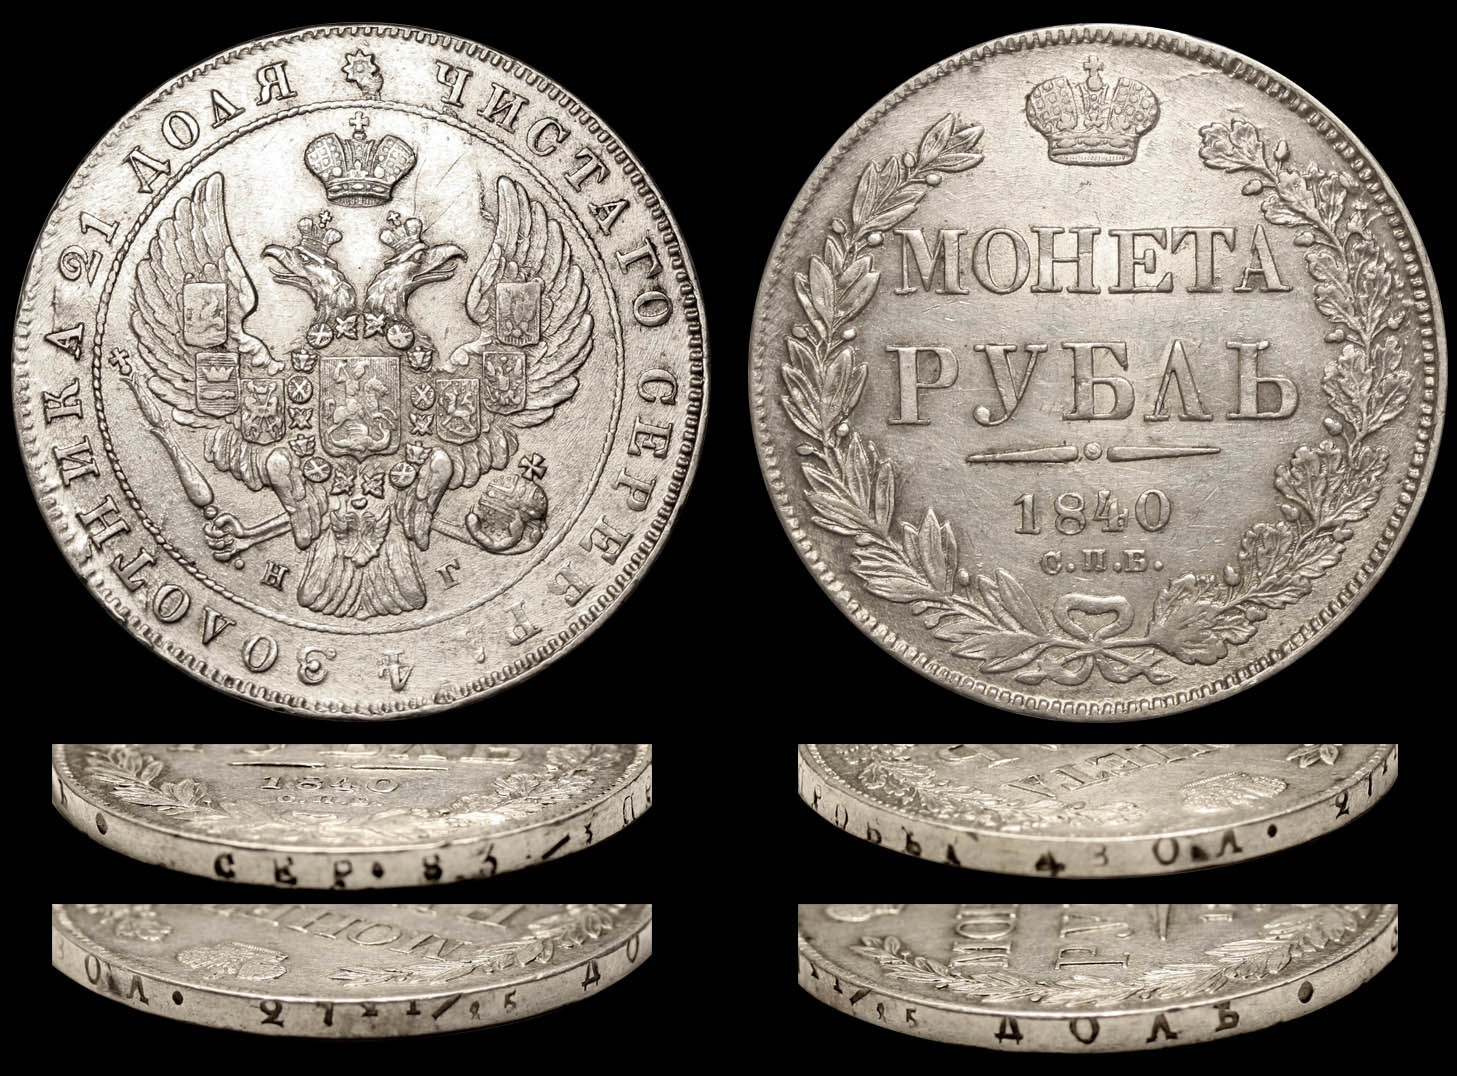 Рубль 1840 СПБ-НГ гурт смешанный.jpg